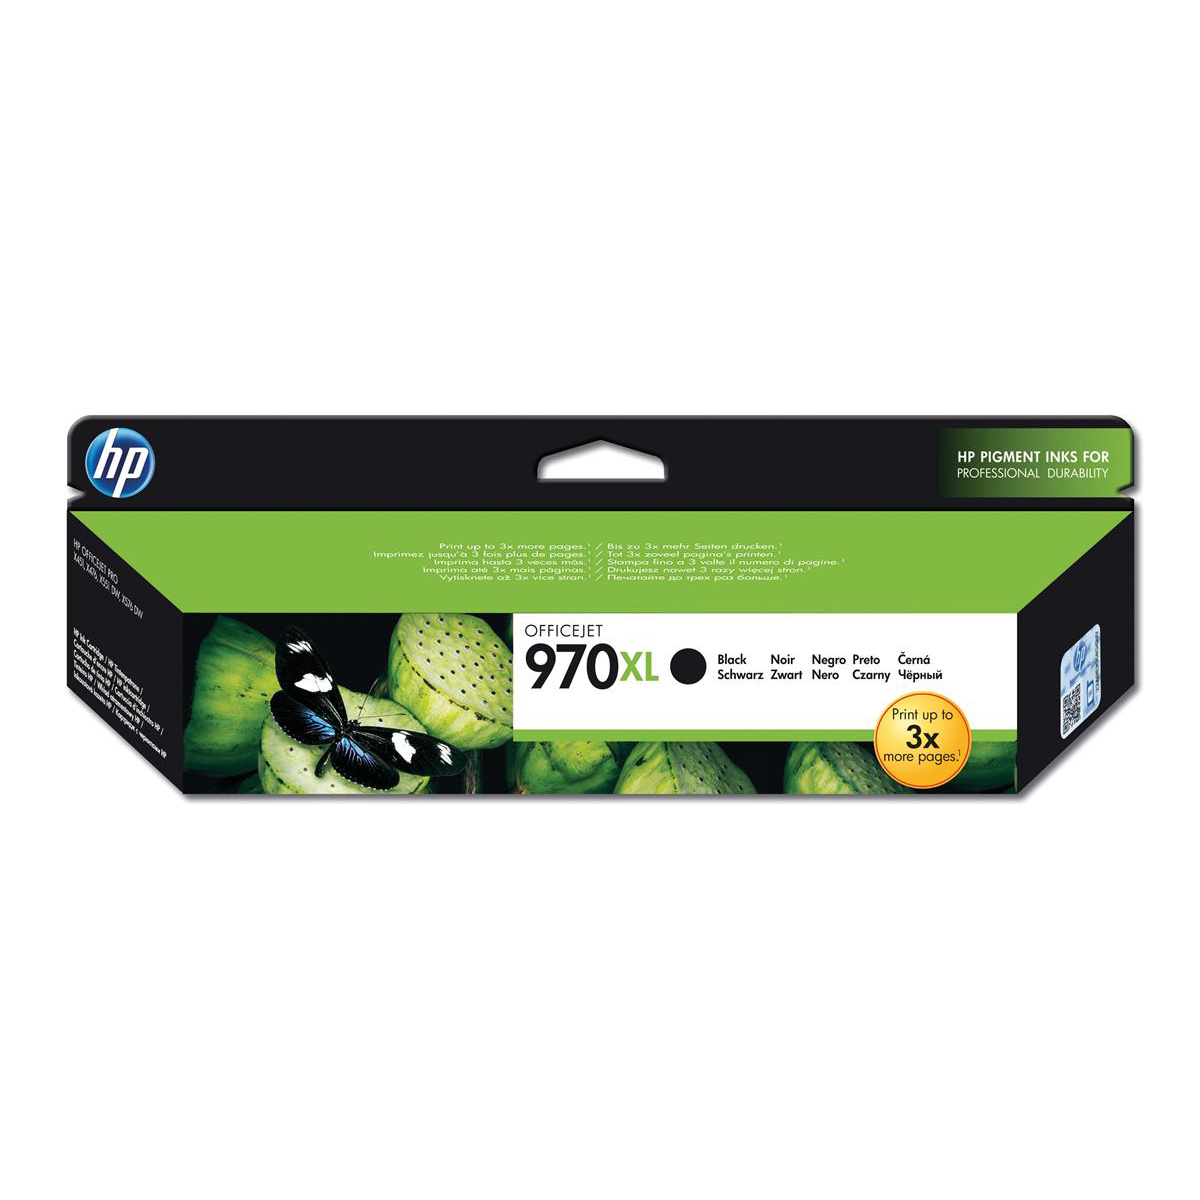 Hewlett Packard [HP] No.970XL Inkjet Cartridge High Yield Page Life 9200pp 173.5ml Black Ref CN625AE